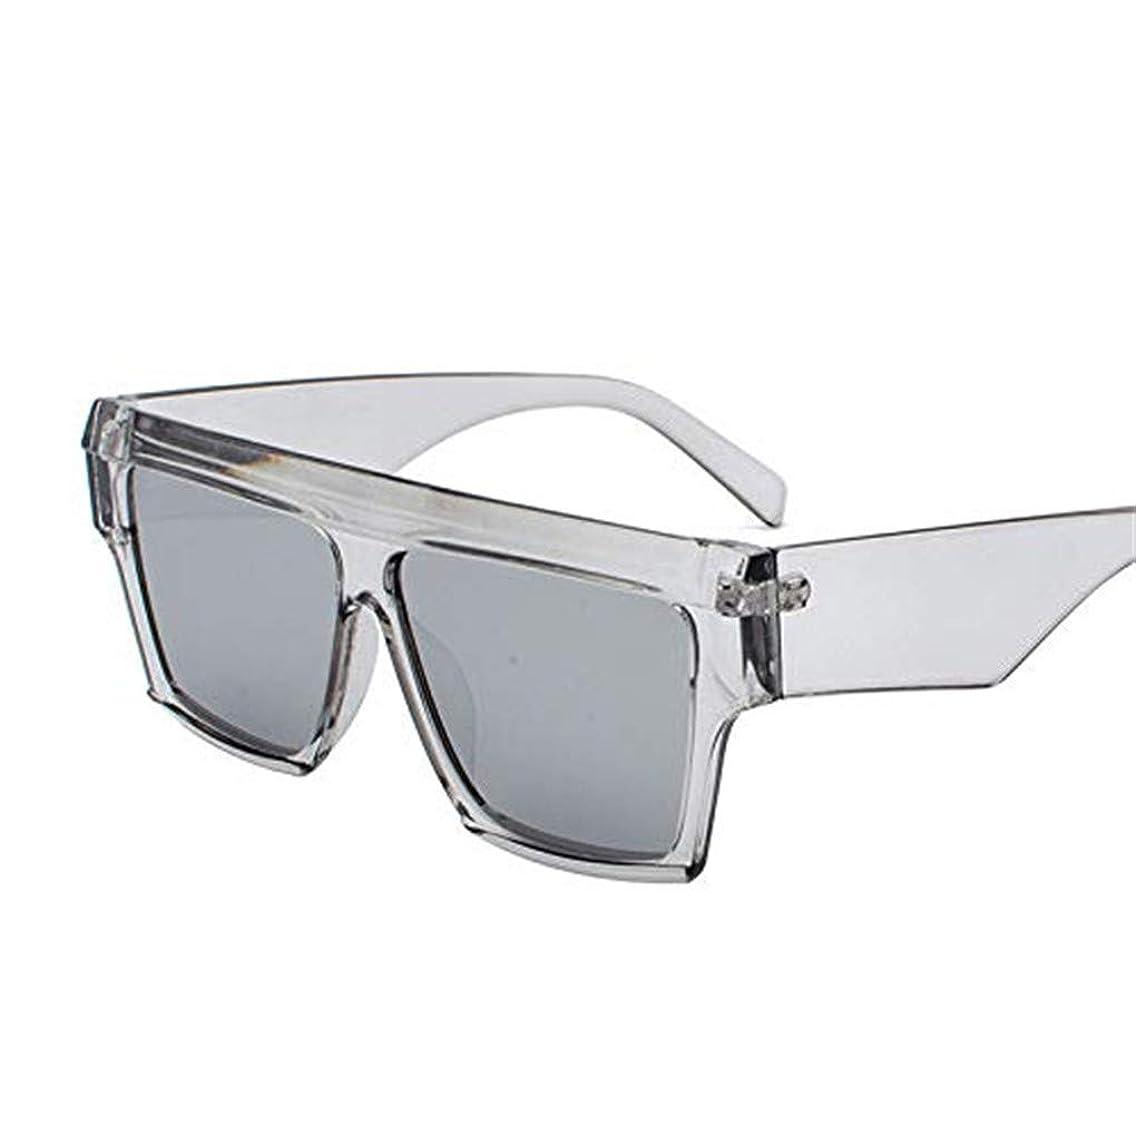 Women Polarized Sunglasses TANGSen Retro Fashion Sunglasses Mirrored Lens Fashion Goggle Eyewear Glasss